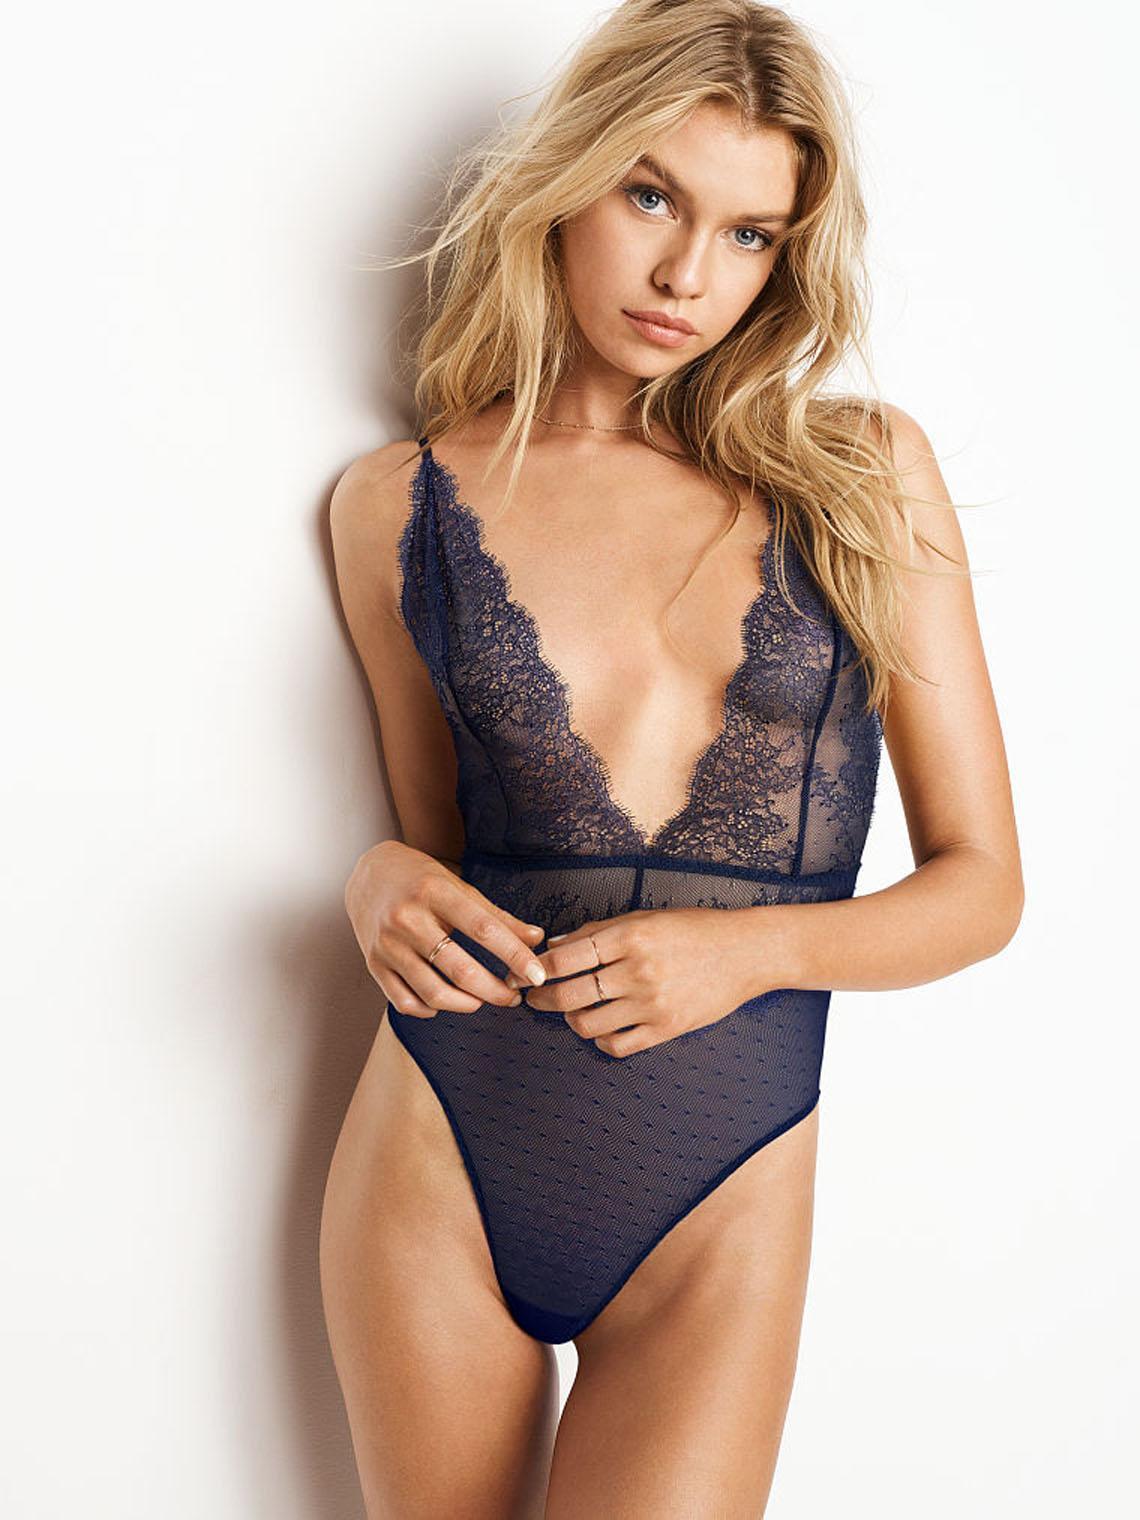 Stella Maxwell sexy lingerie pics